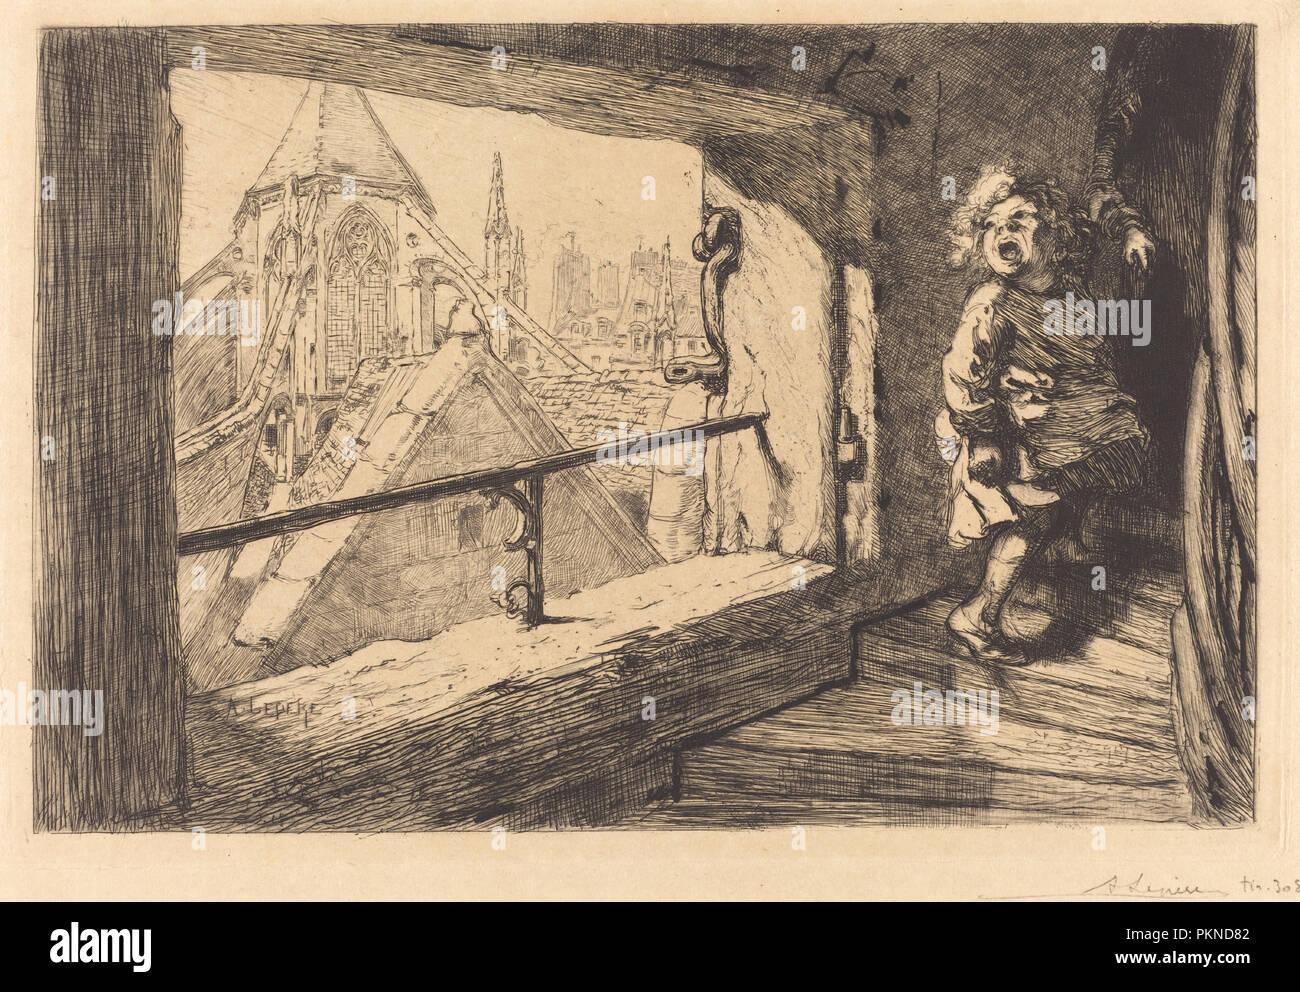 Les toits de Saint-Severin. Dated: 1889. Medium: etching. Museum: National Gallery of Art, Washington DC. Author: Auguste Lepere. Stock Photo